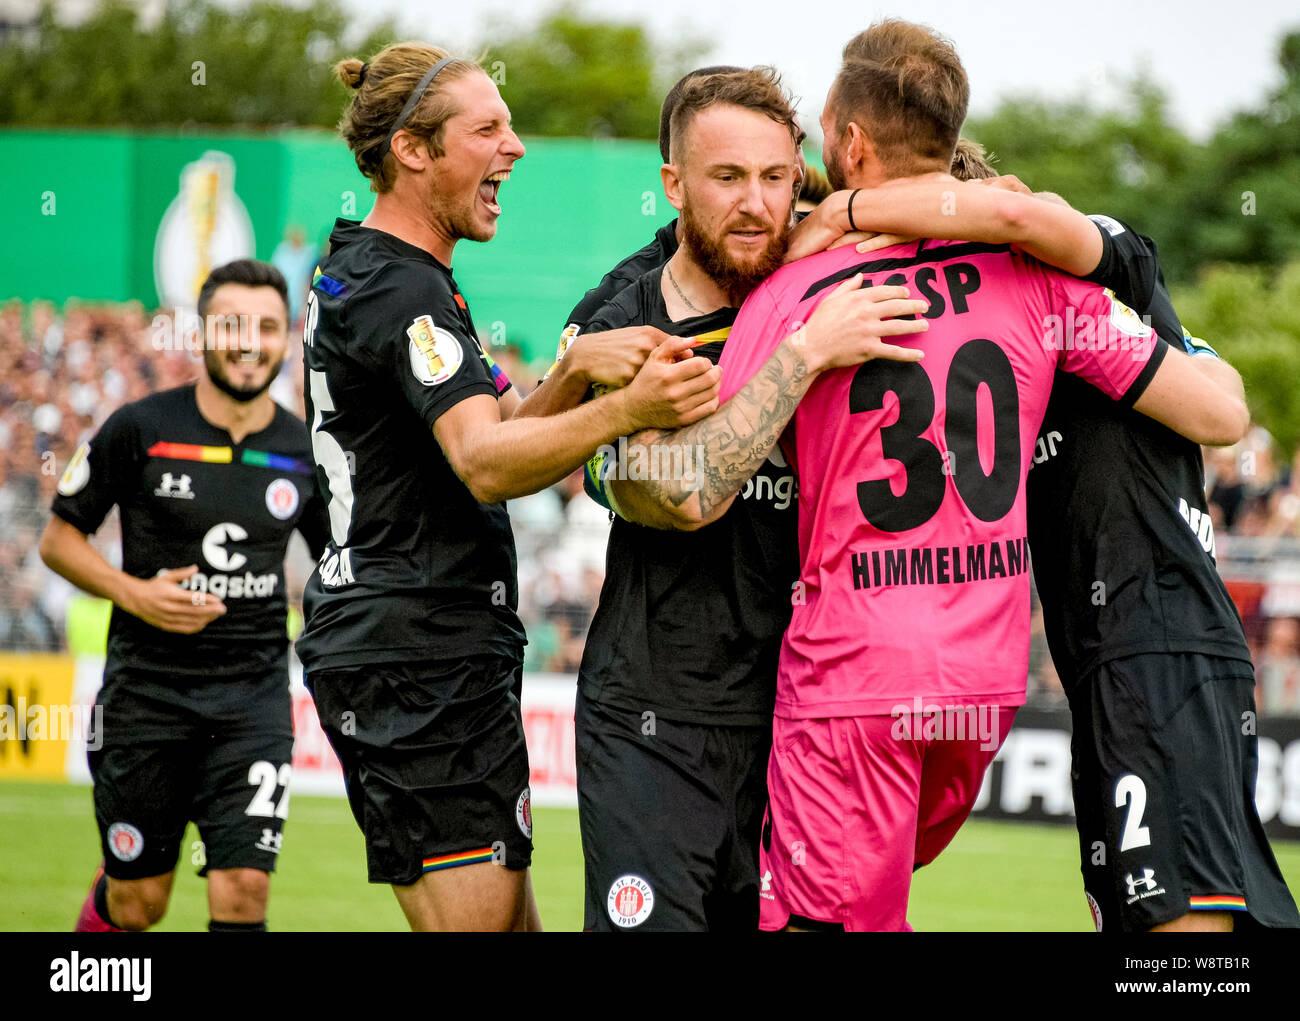 11 August 2019 Schleswig Holstein Lubeck Soccer Dfb Cup Vfb Lubeck Fc St Pauli 1st Round St Paulis Cenk Sahin L R St Paulis Daniel Bulballa St Paulis Marvin Knoll St Paulis Goalkeeper